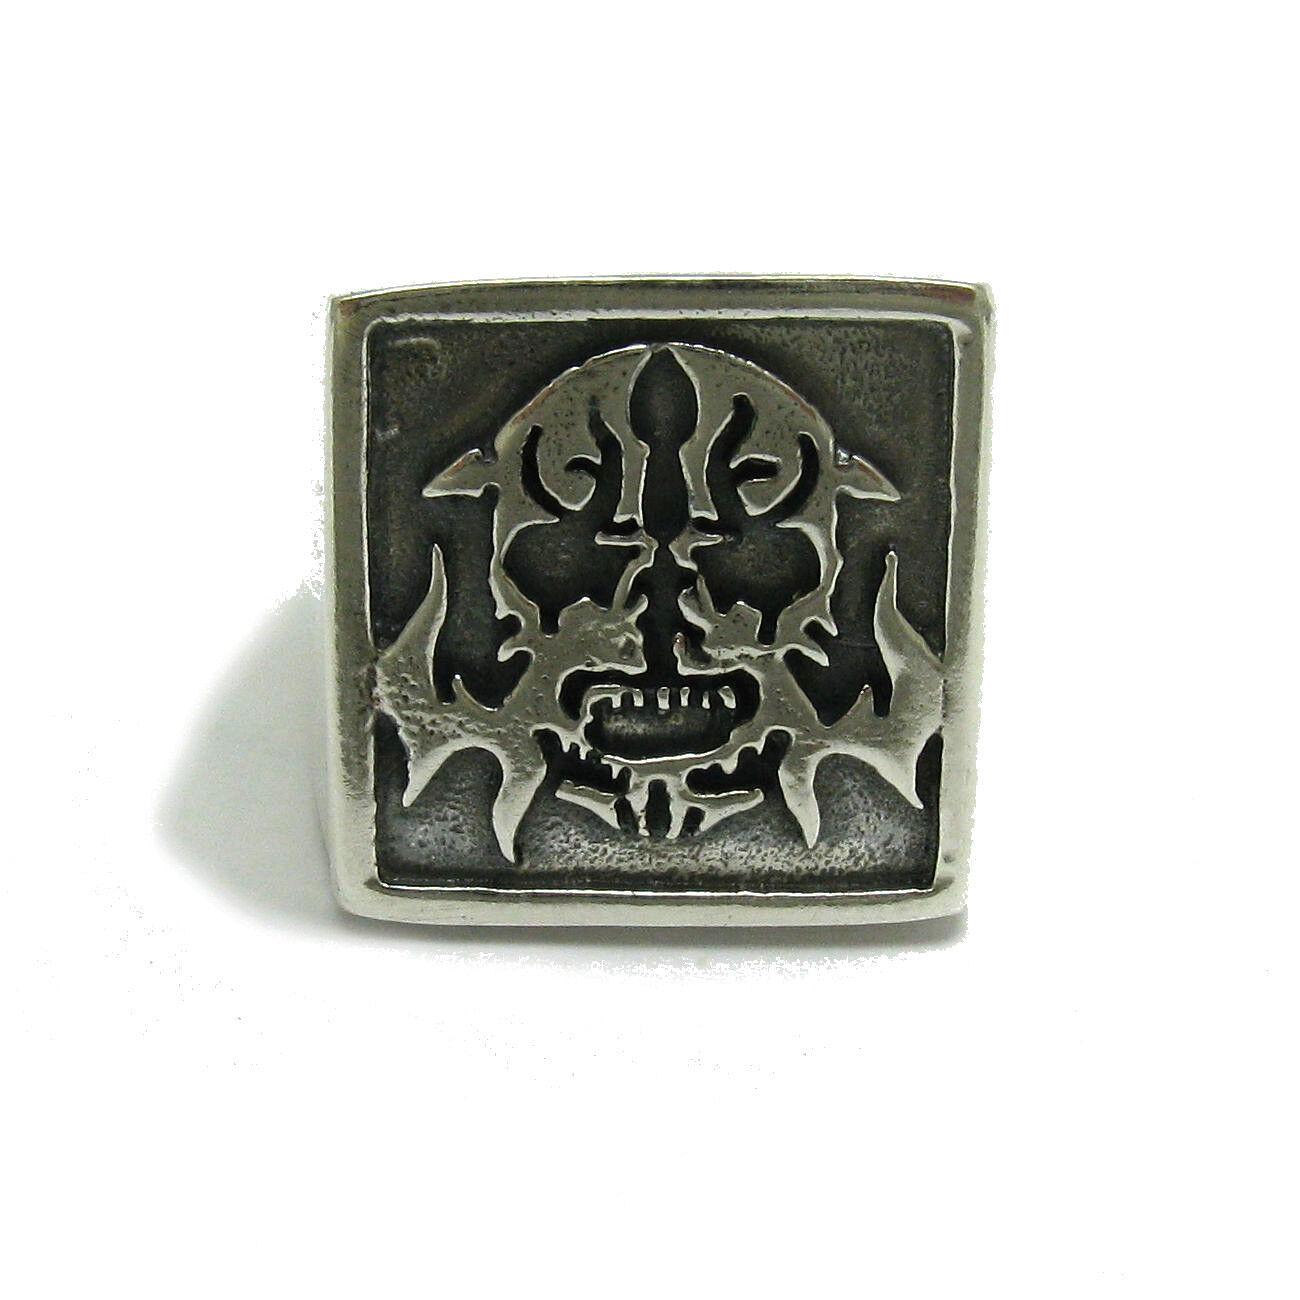 925 silver herren ring Totenkopf R000843 EMPRESS